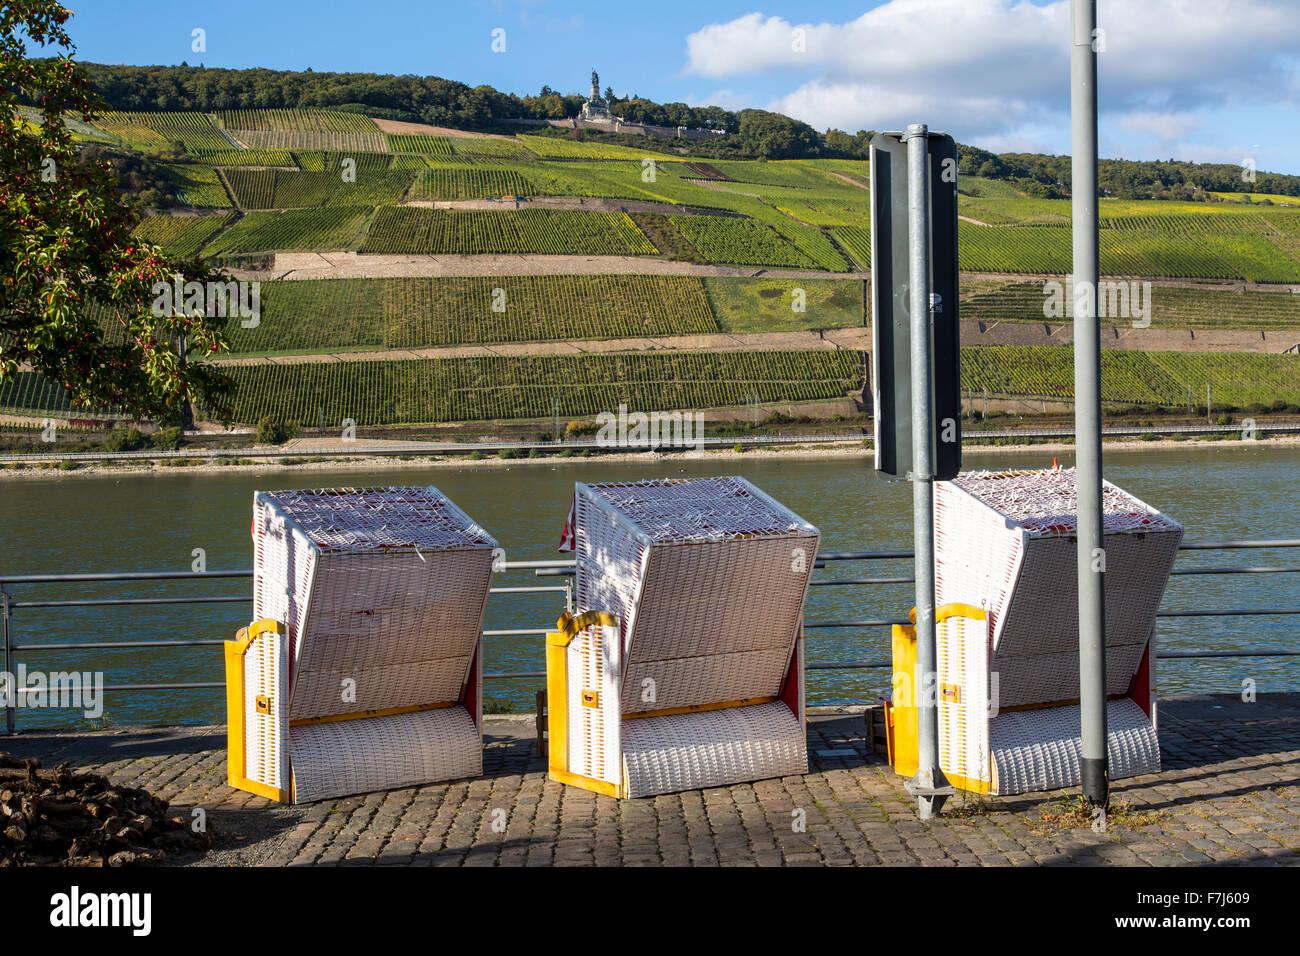 City of Bingen, upper middle Rhine valley, Germany, rive Rhine promenade, - Stock Image